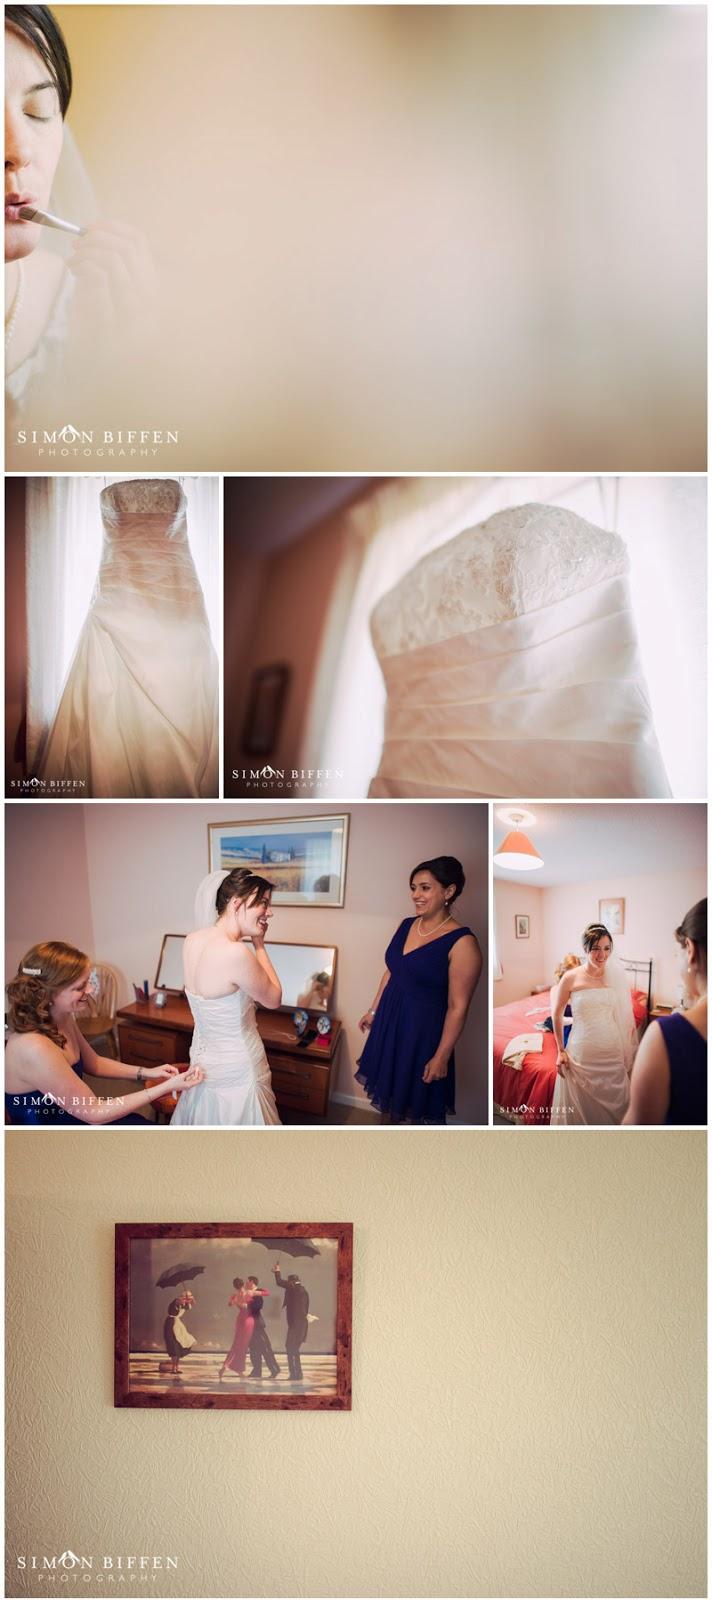 Bridal preparation photographs